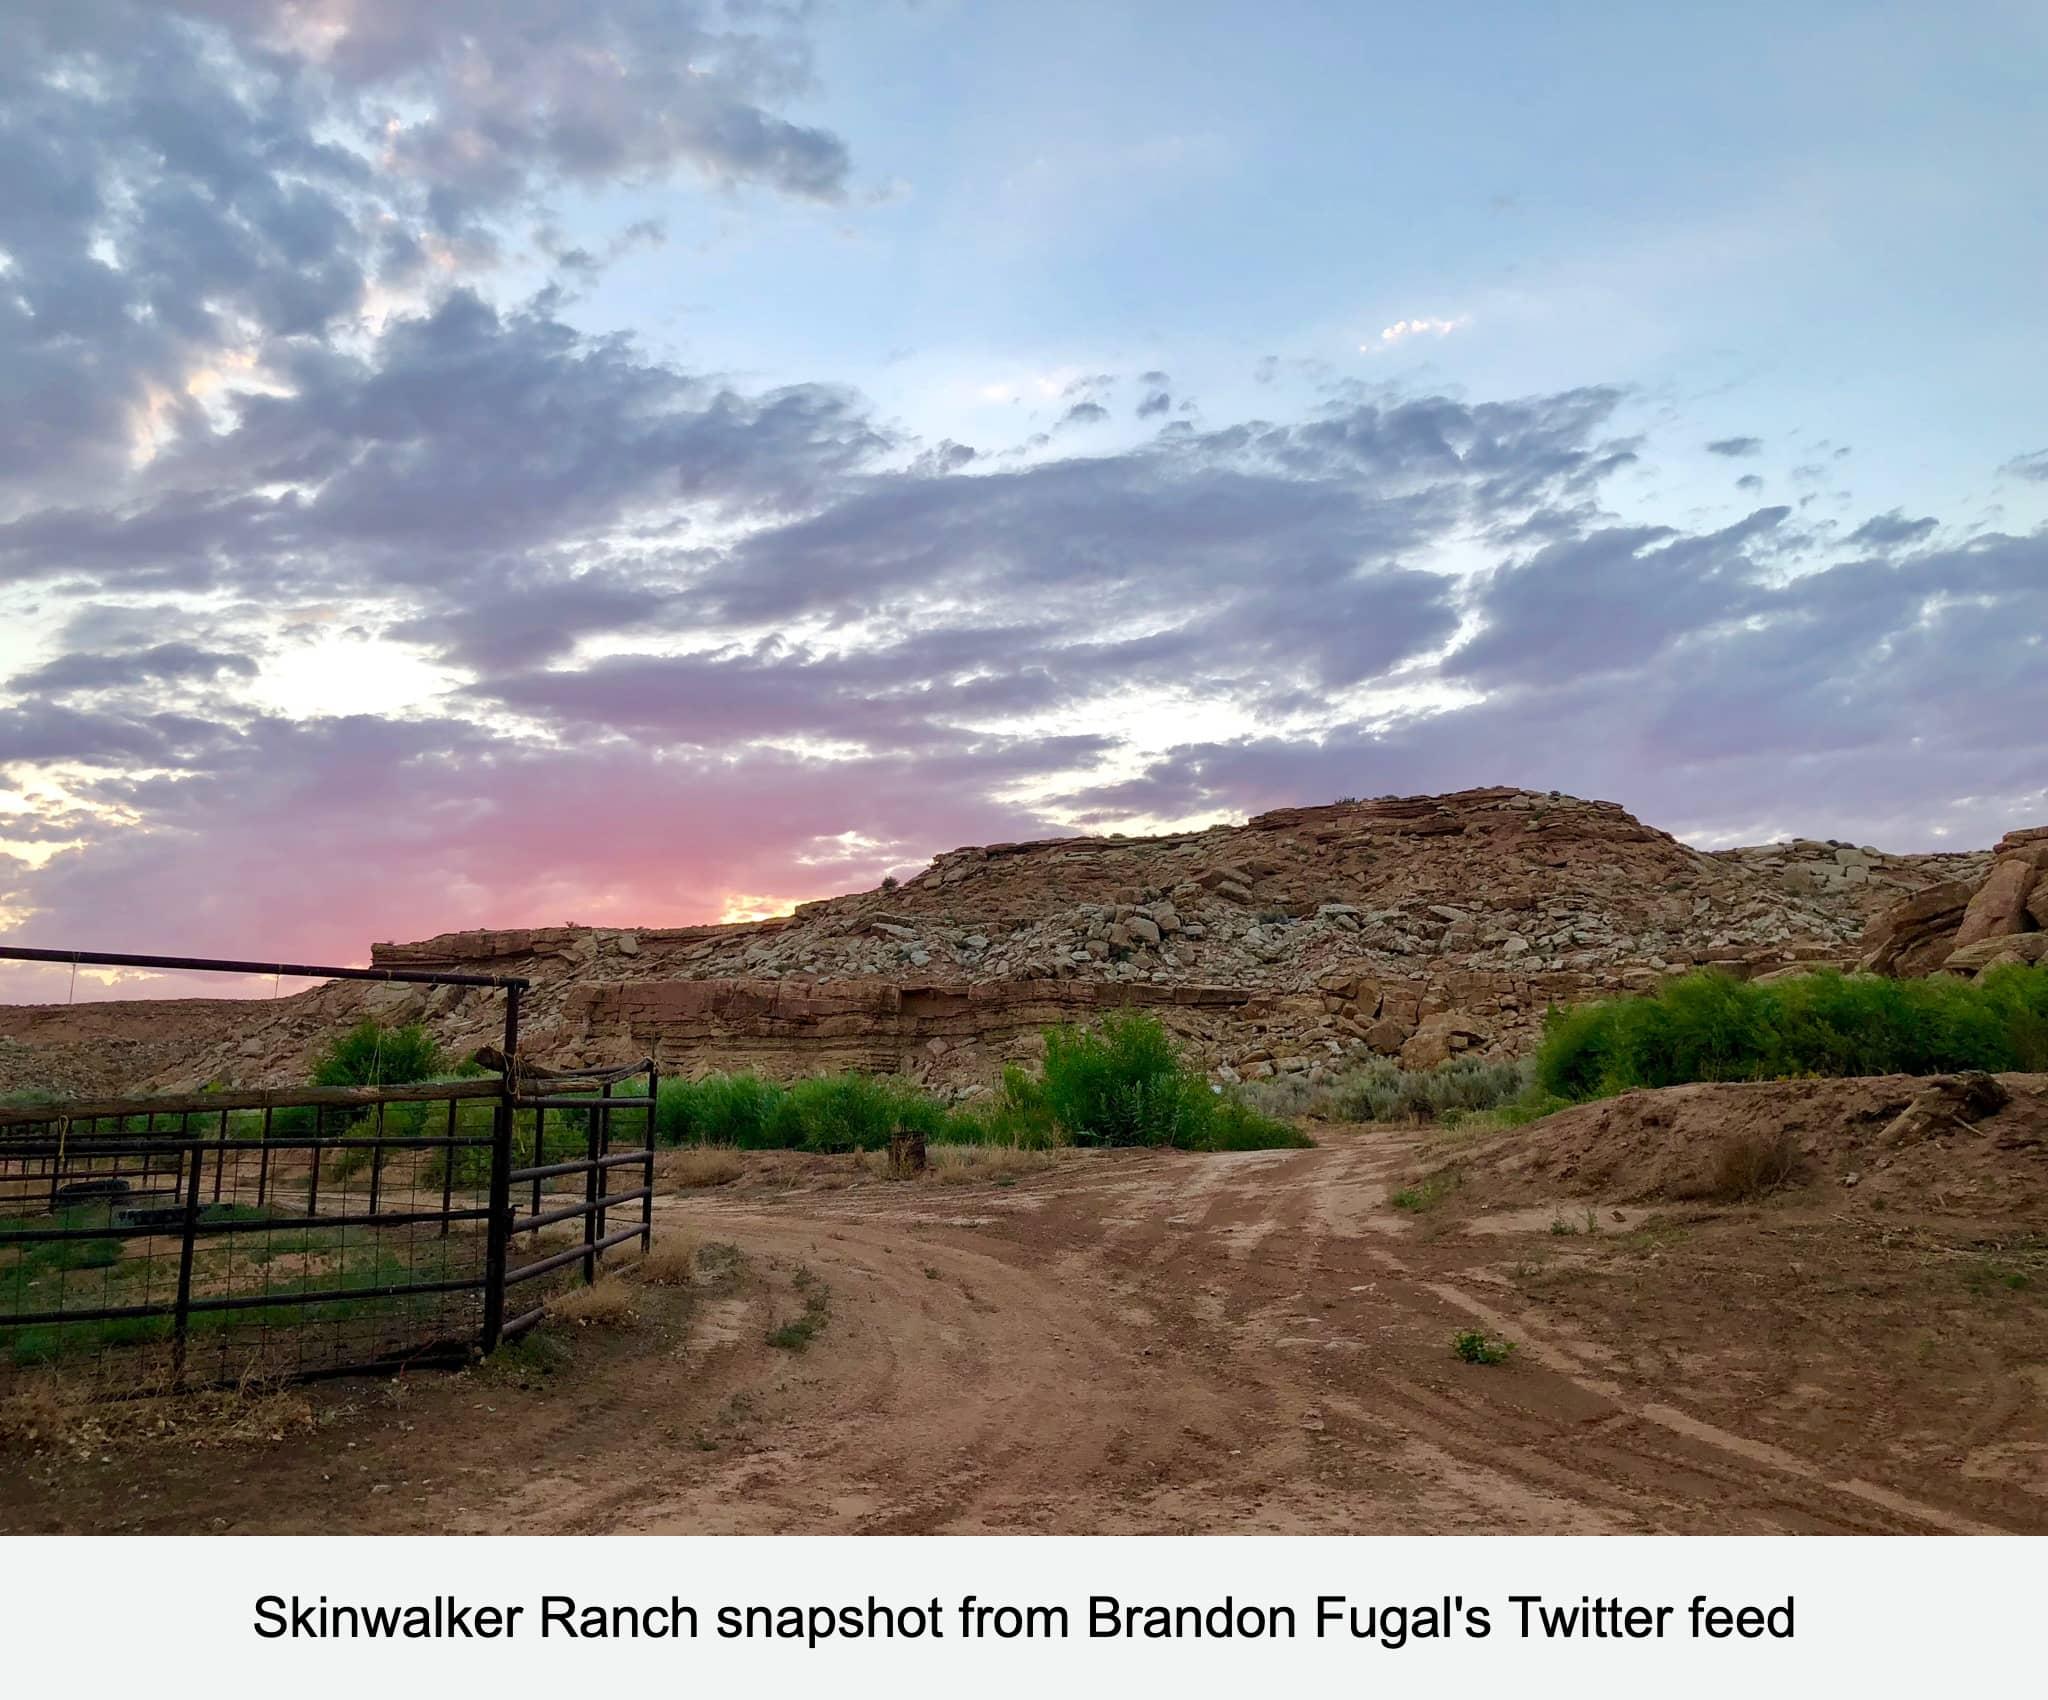 Skinwalker Ranch snapshot from Brandon Fugal's Twitter feed